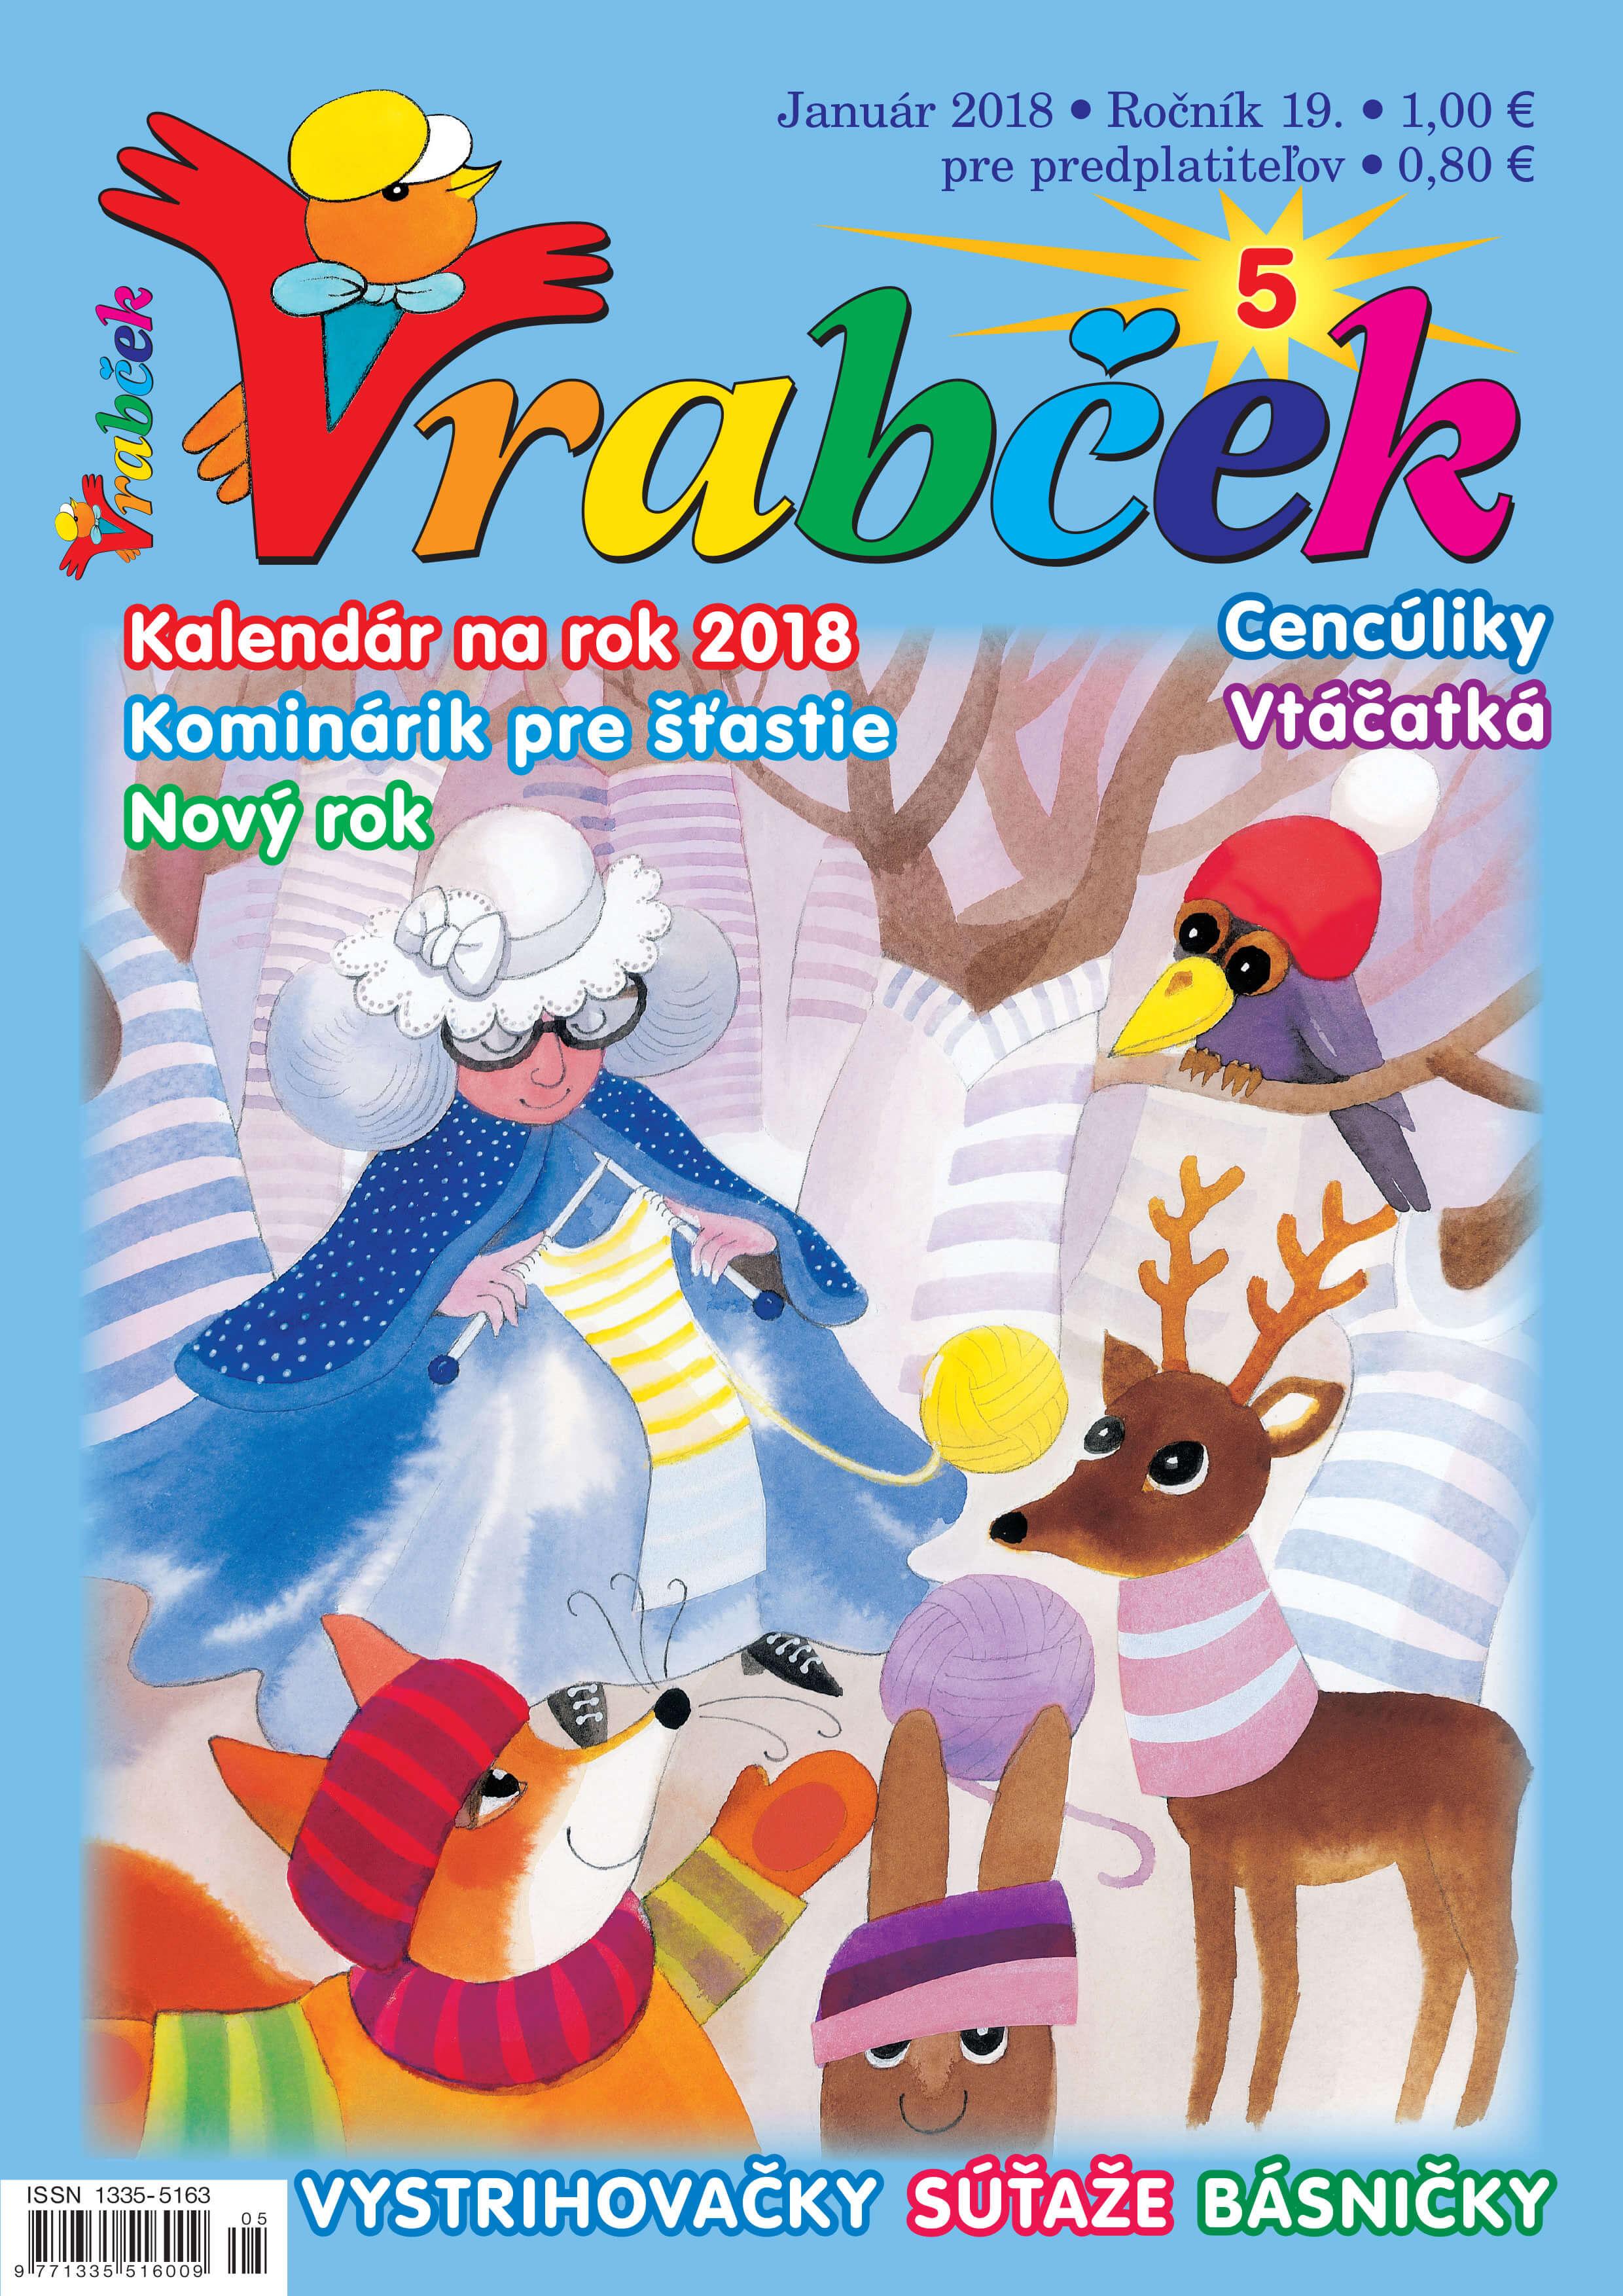 časopis Vrabček december 2017 obálkačasopis Vrabček január 2018 obálka